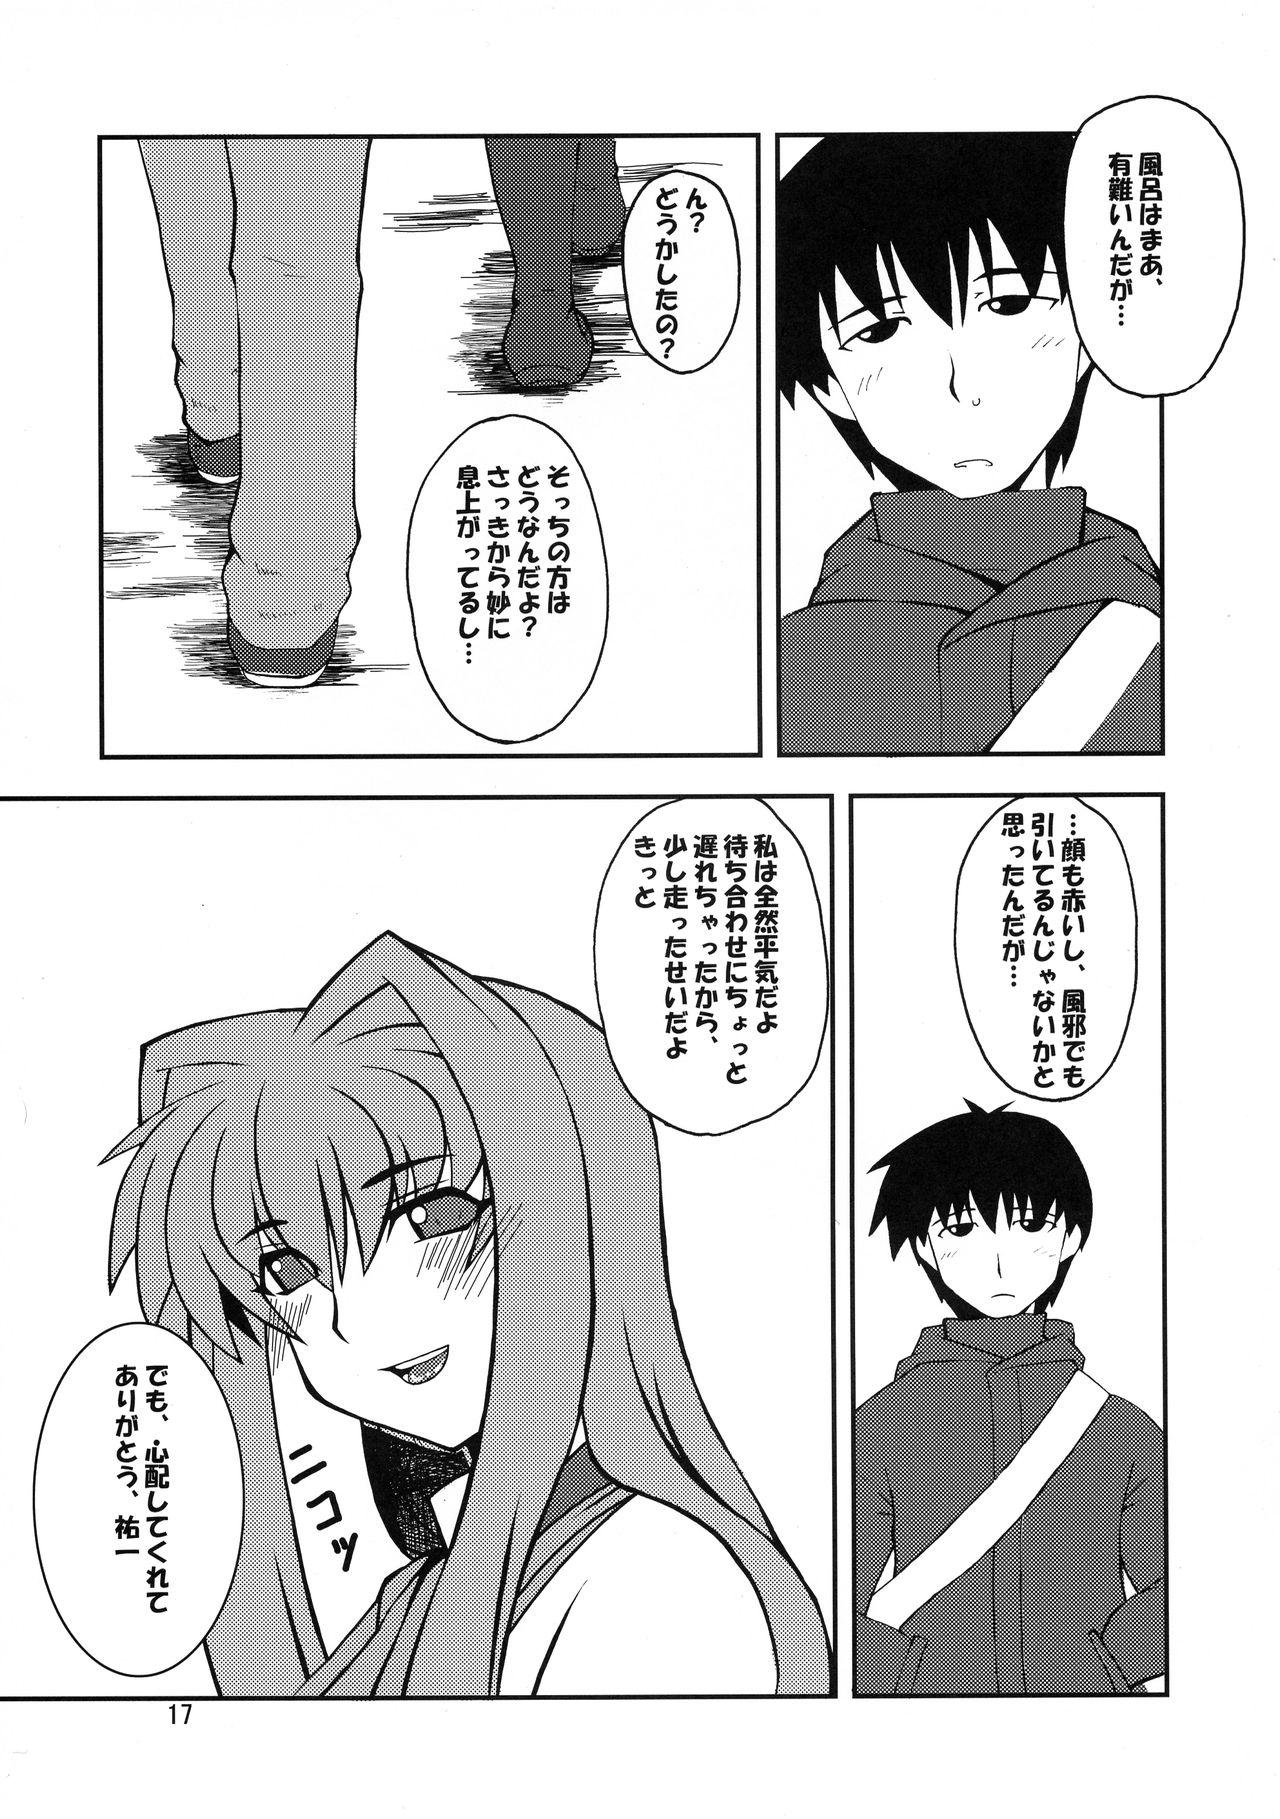 Kyouki Vol. 3~5 Remake Ver. 16